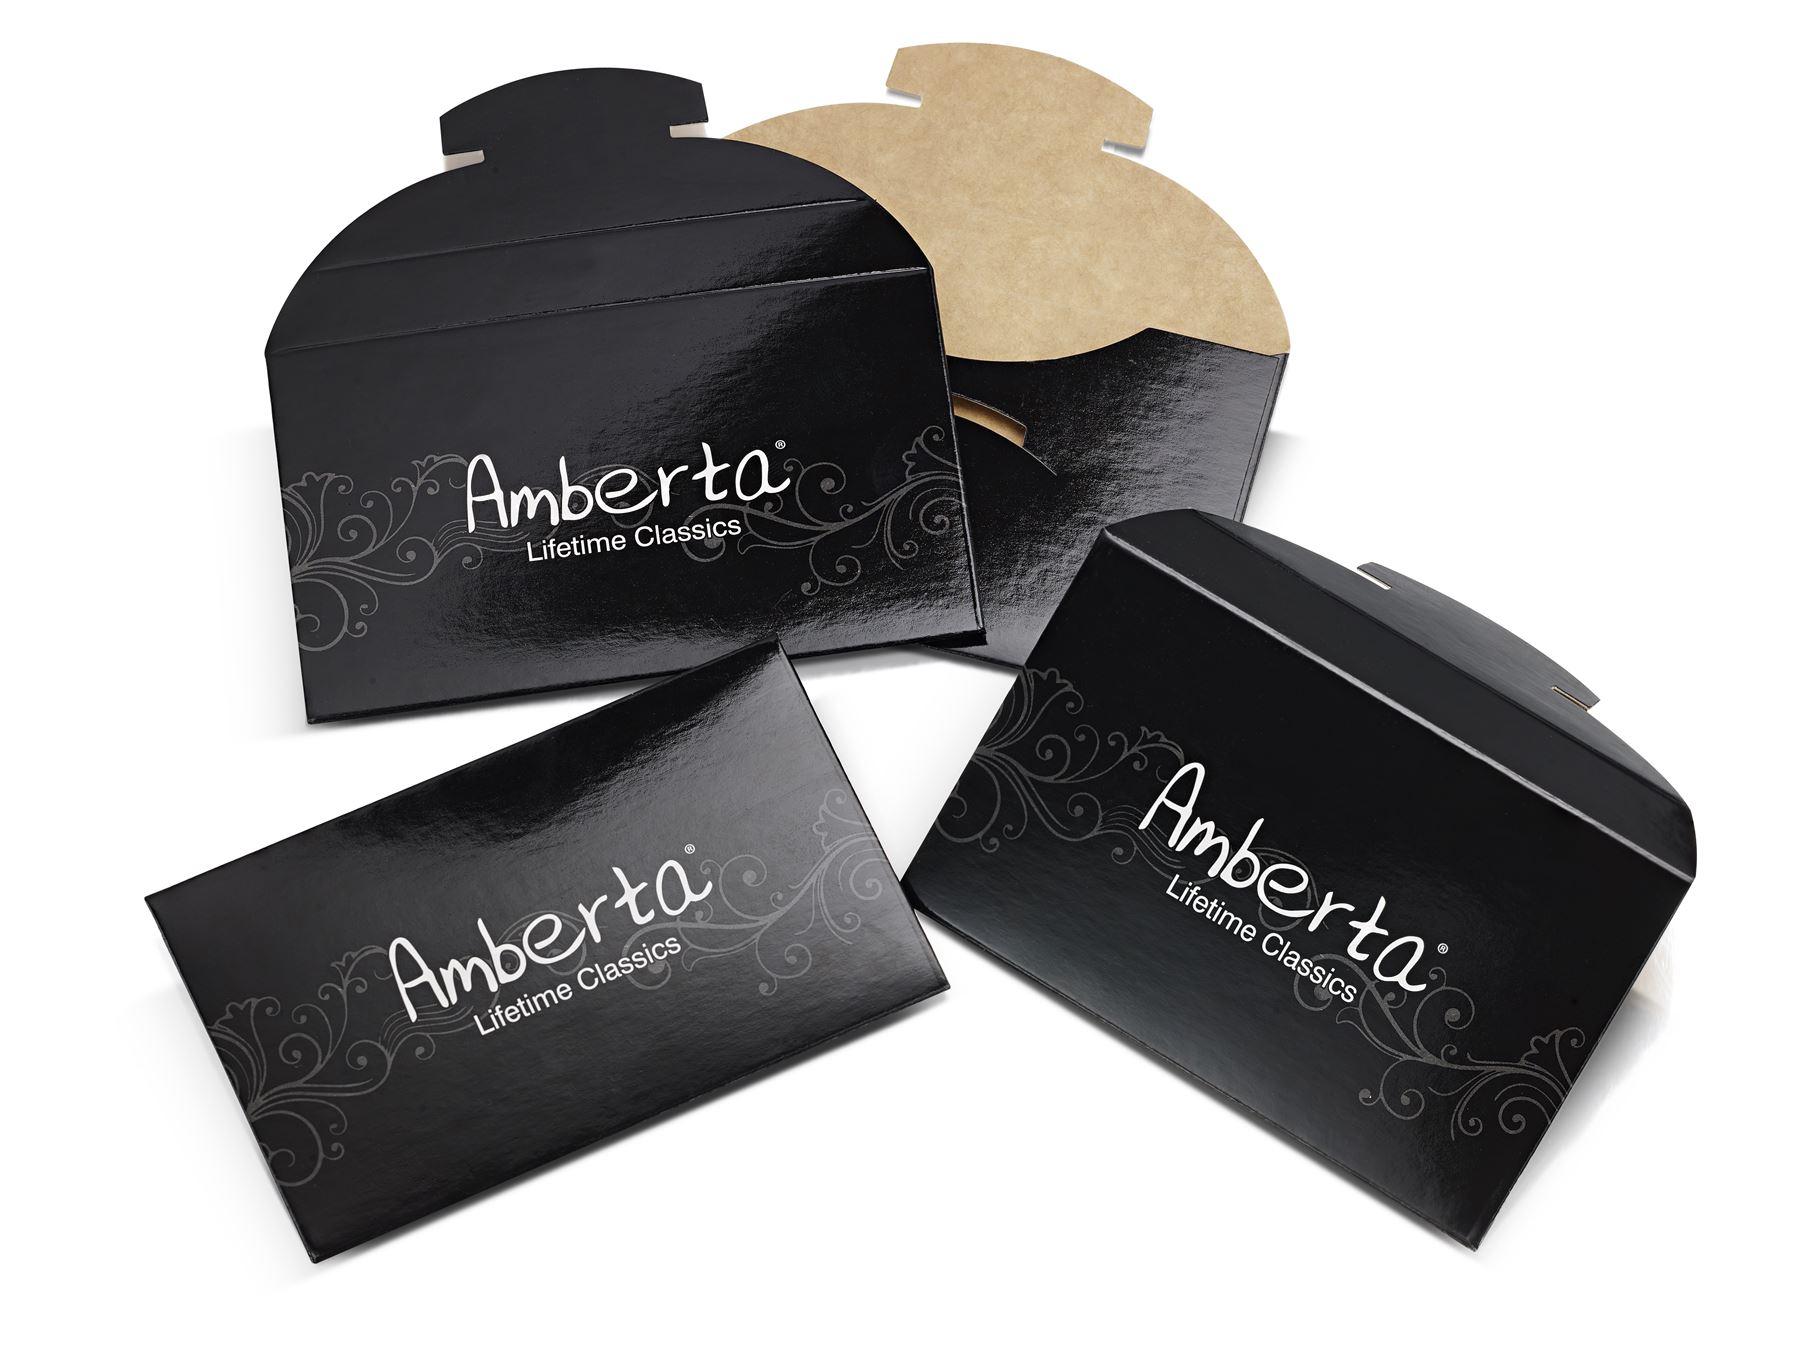 Amberta-Joyeria-Cadena-Italiana-Gruesa-para-Mujer-en-Autentica-Plata-de-Ley-925